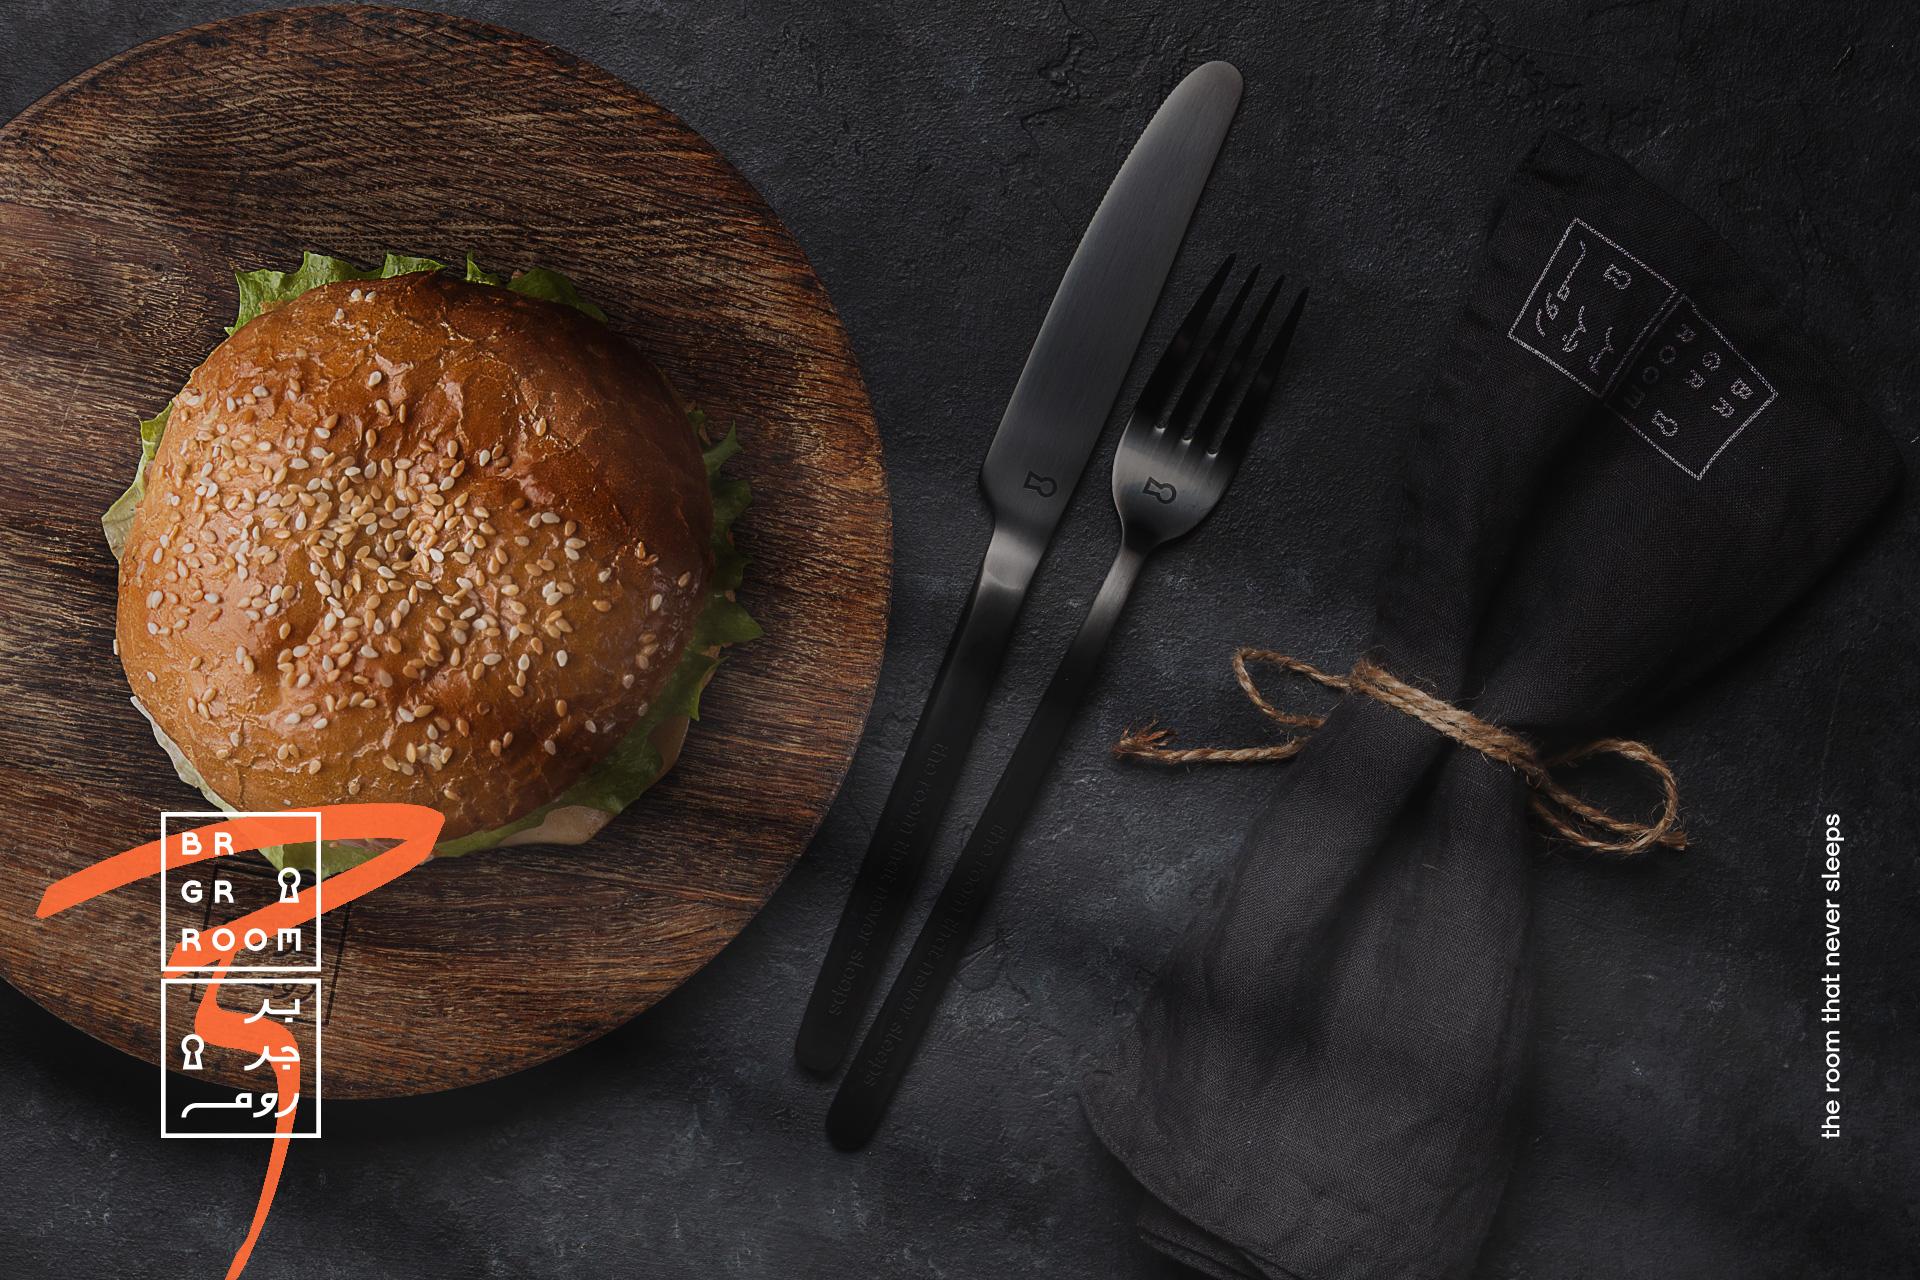 BRGR-002-cutlery